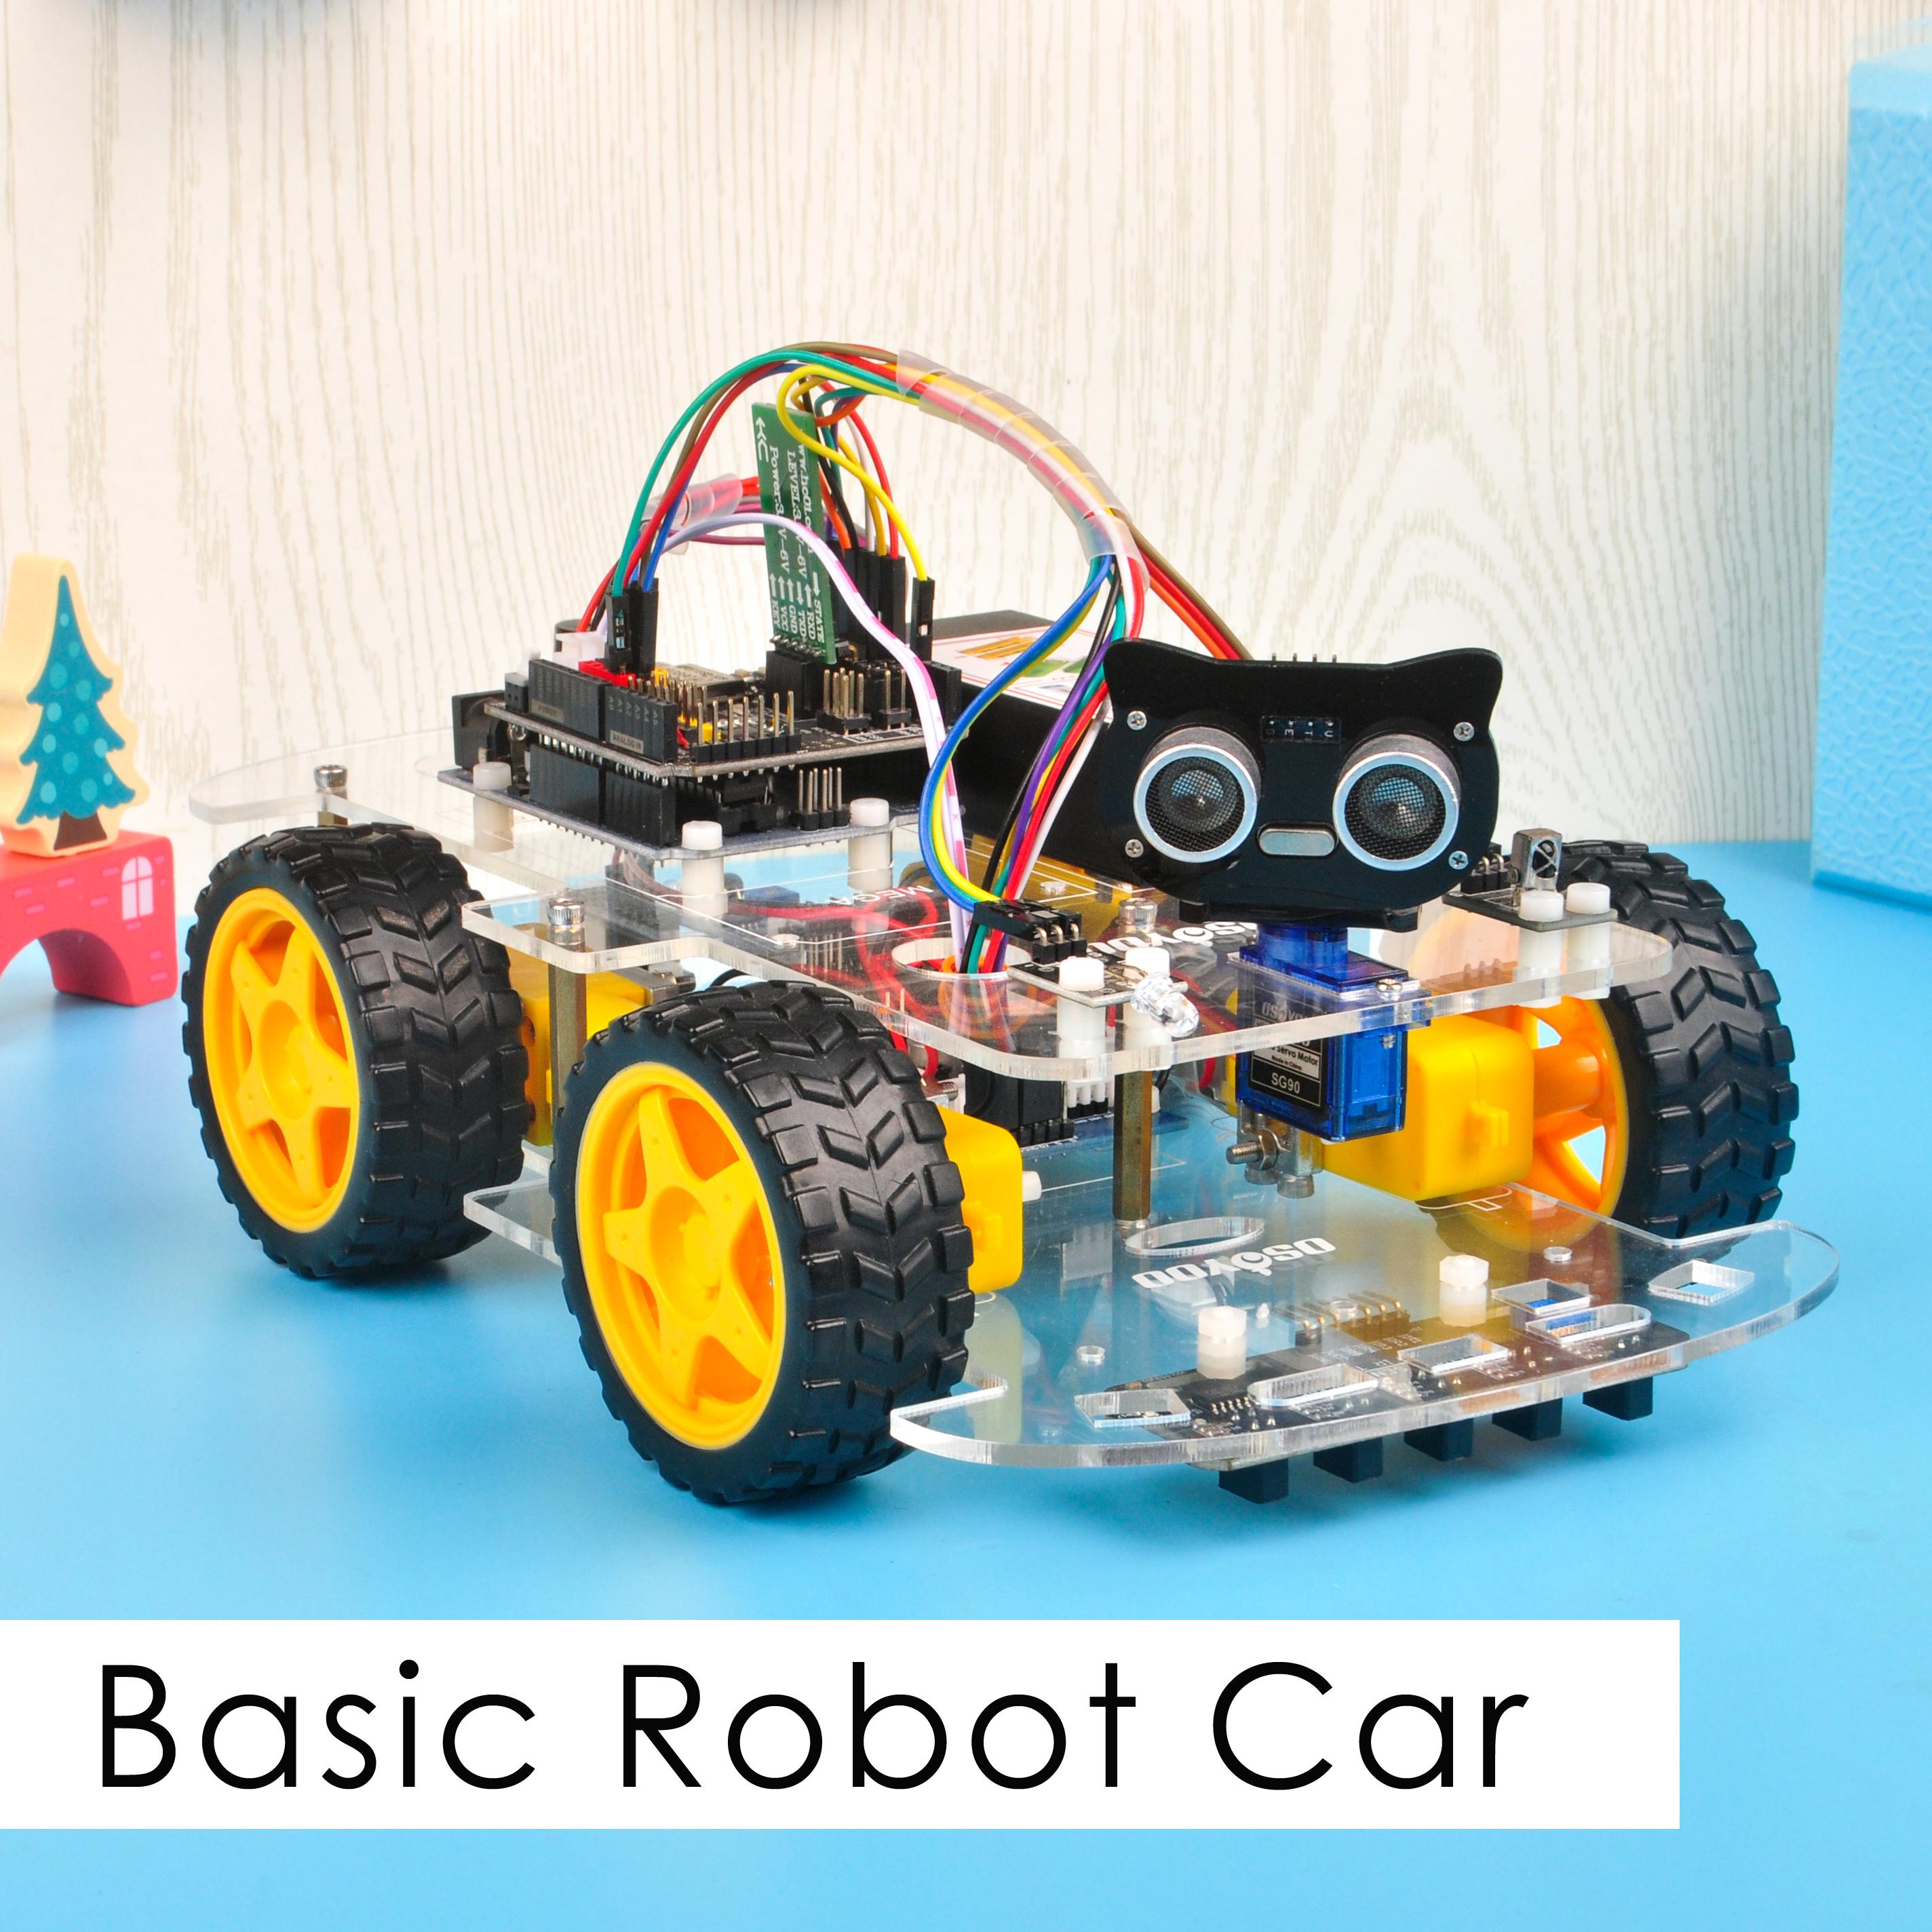 OSOYOO V2.1 Robot car kit Lesson 1: Basic Robot car